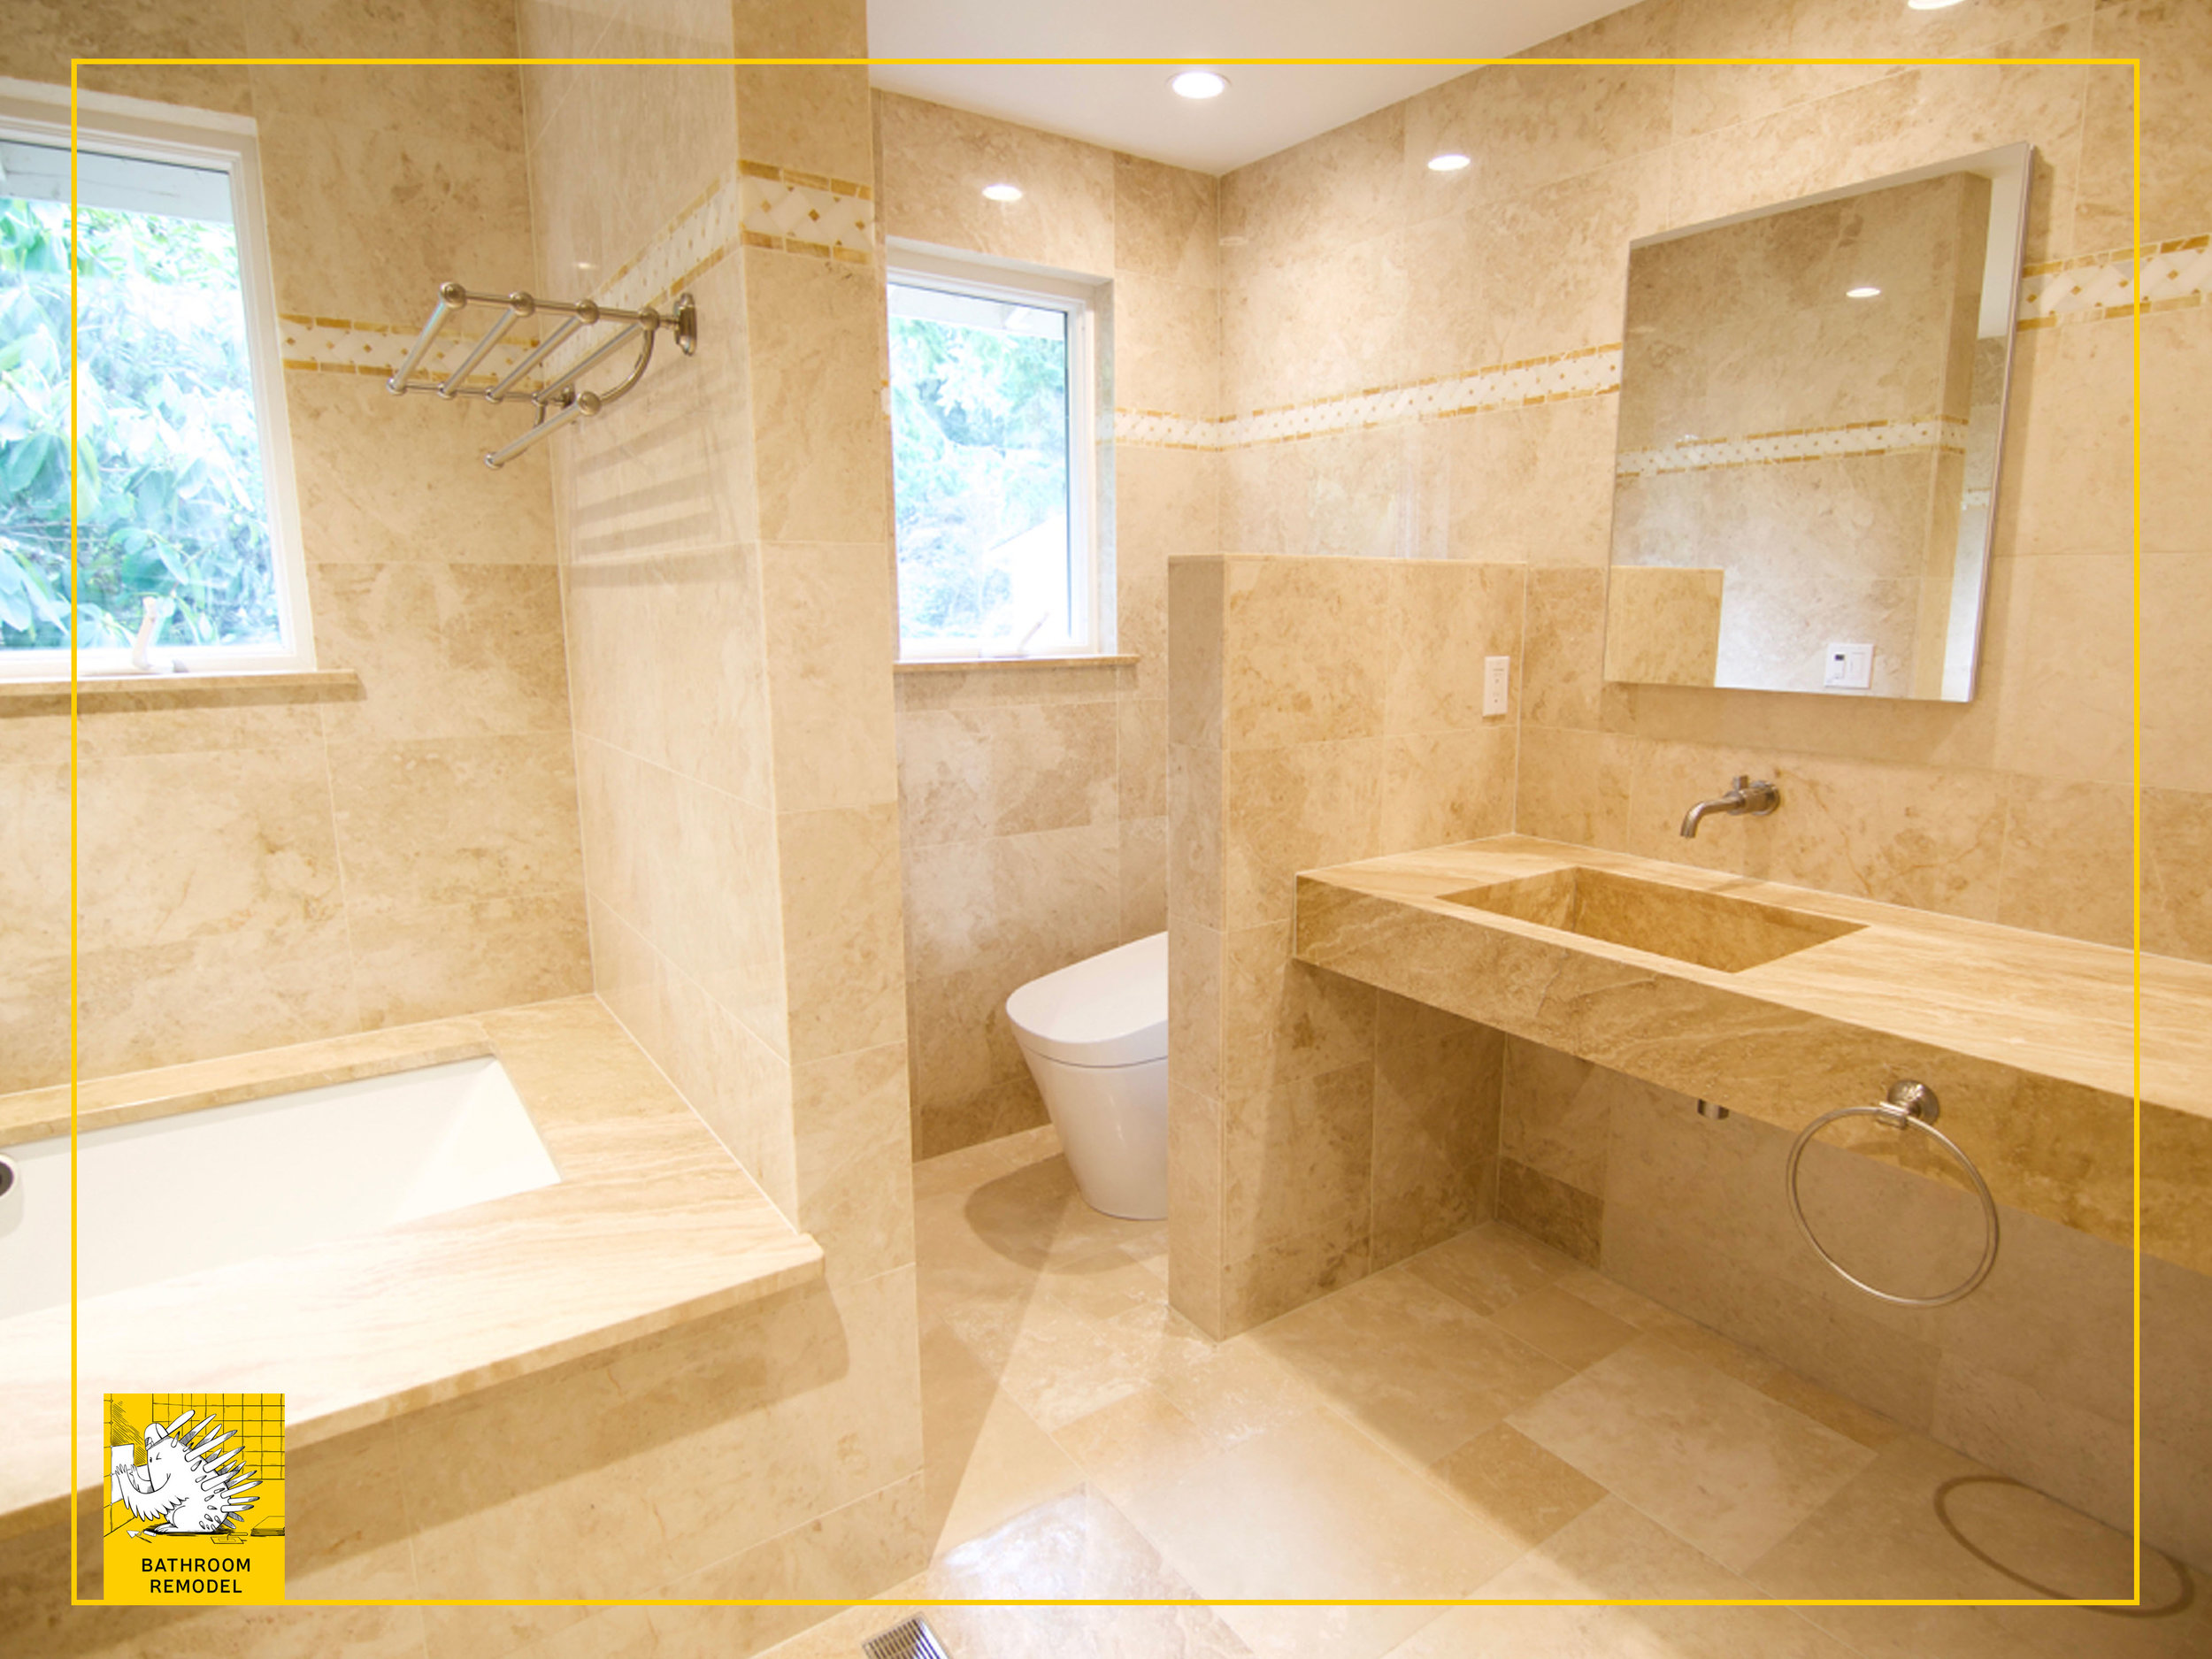 MT bathroom 5 after 4.jpg